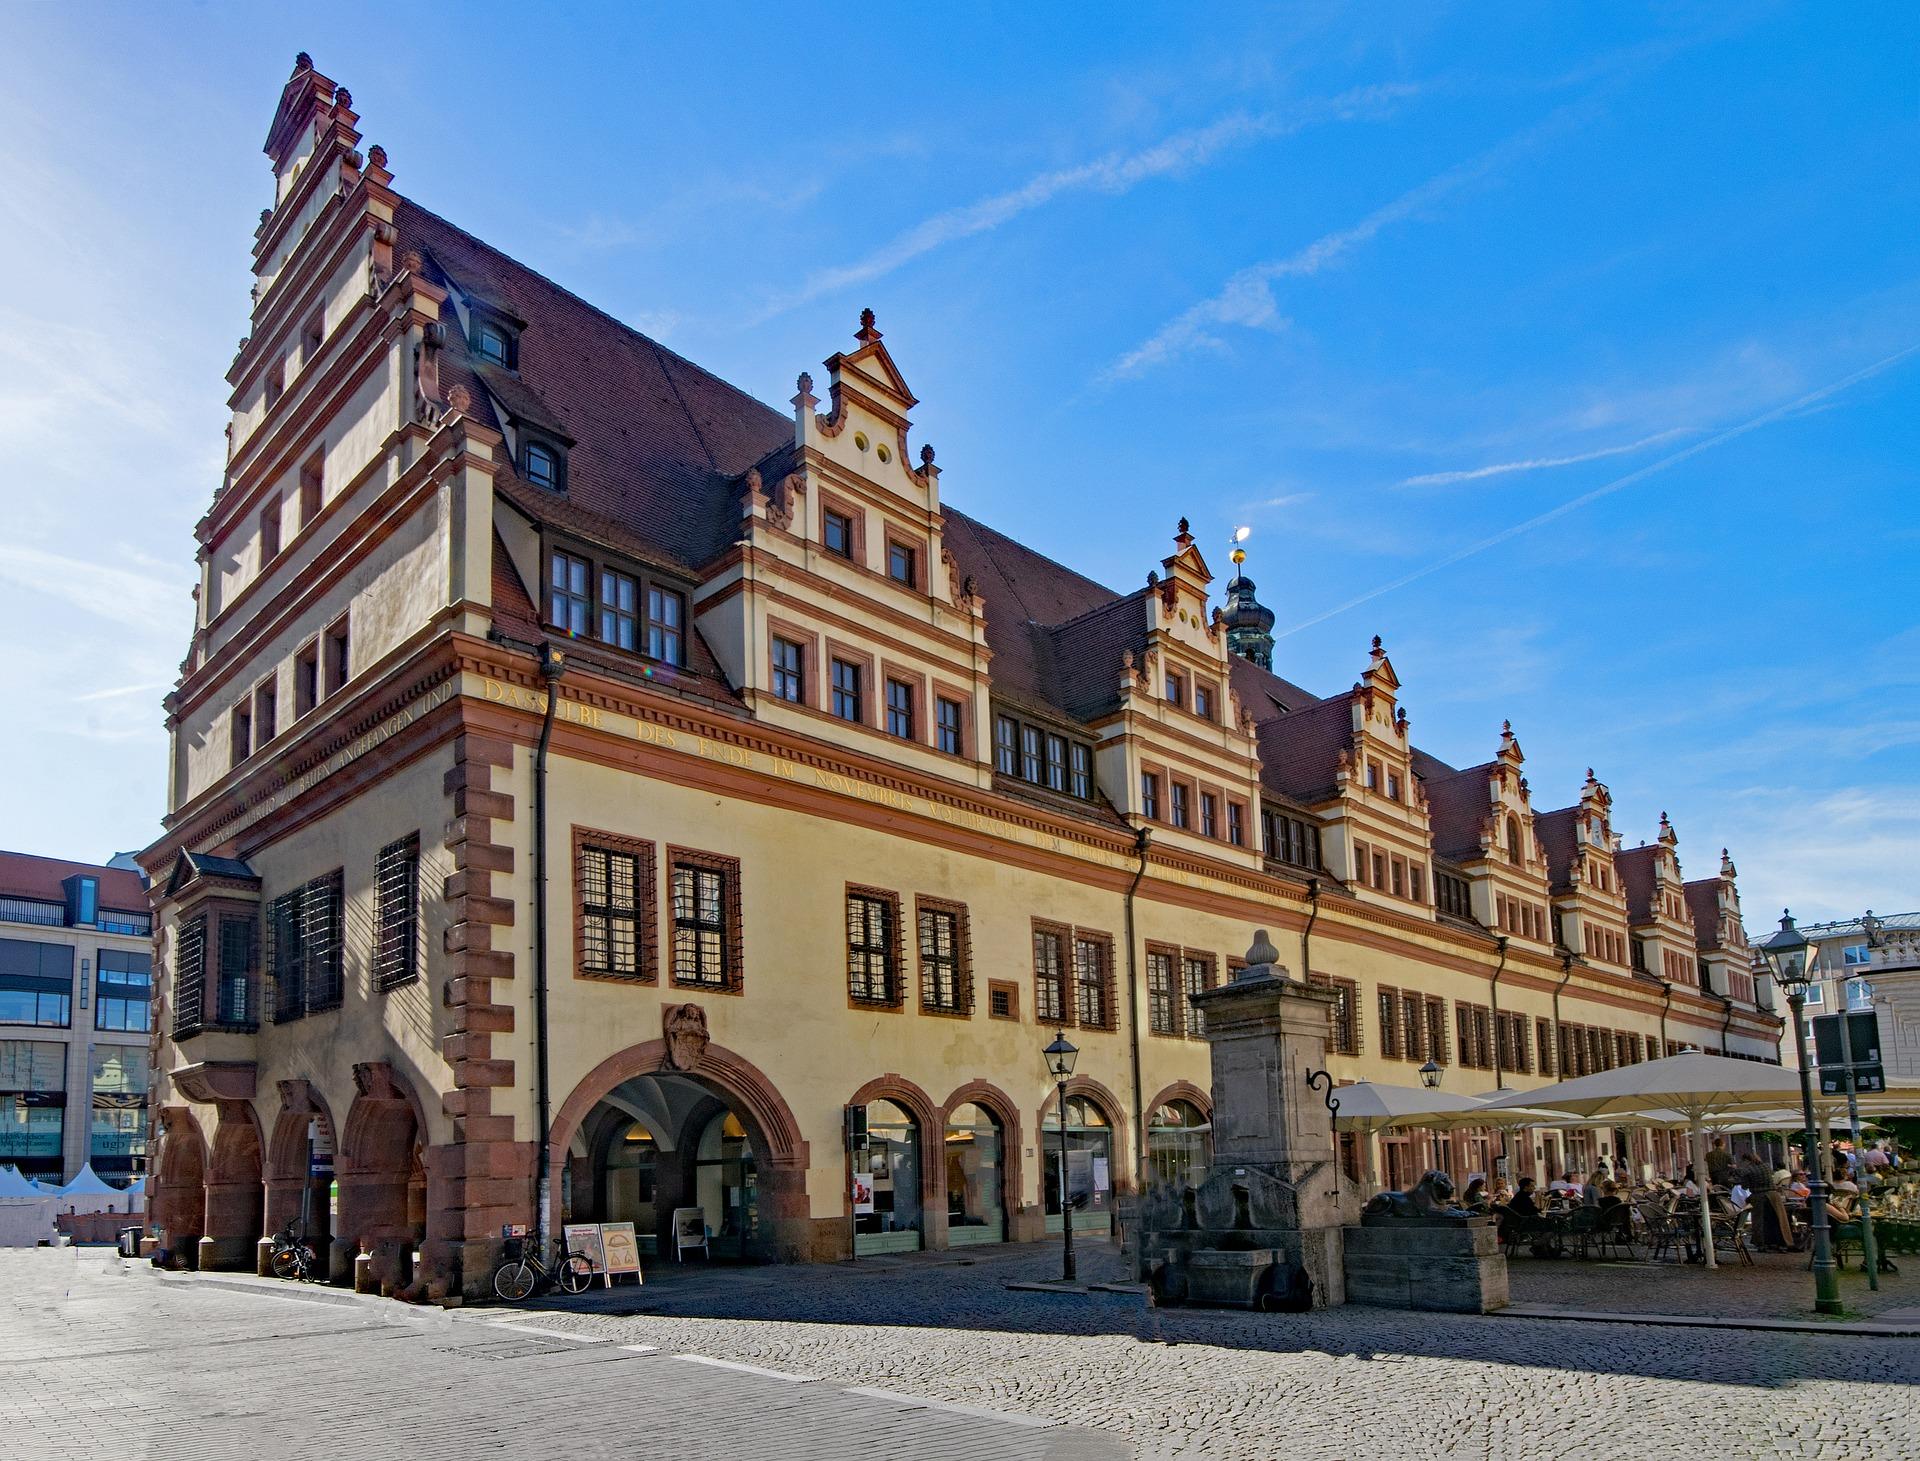 Eimsbüttel Immobilienpreis: Statistiken Hamburg